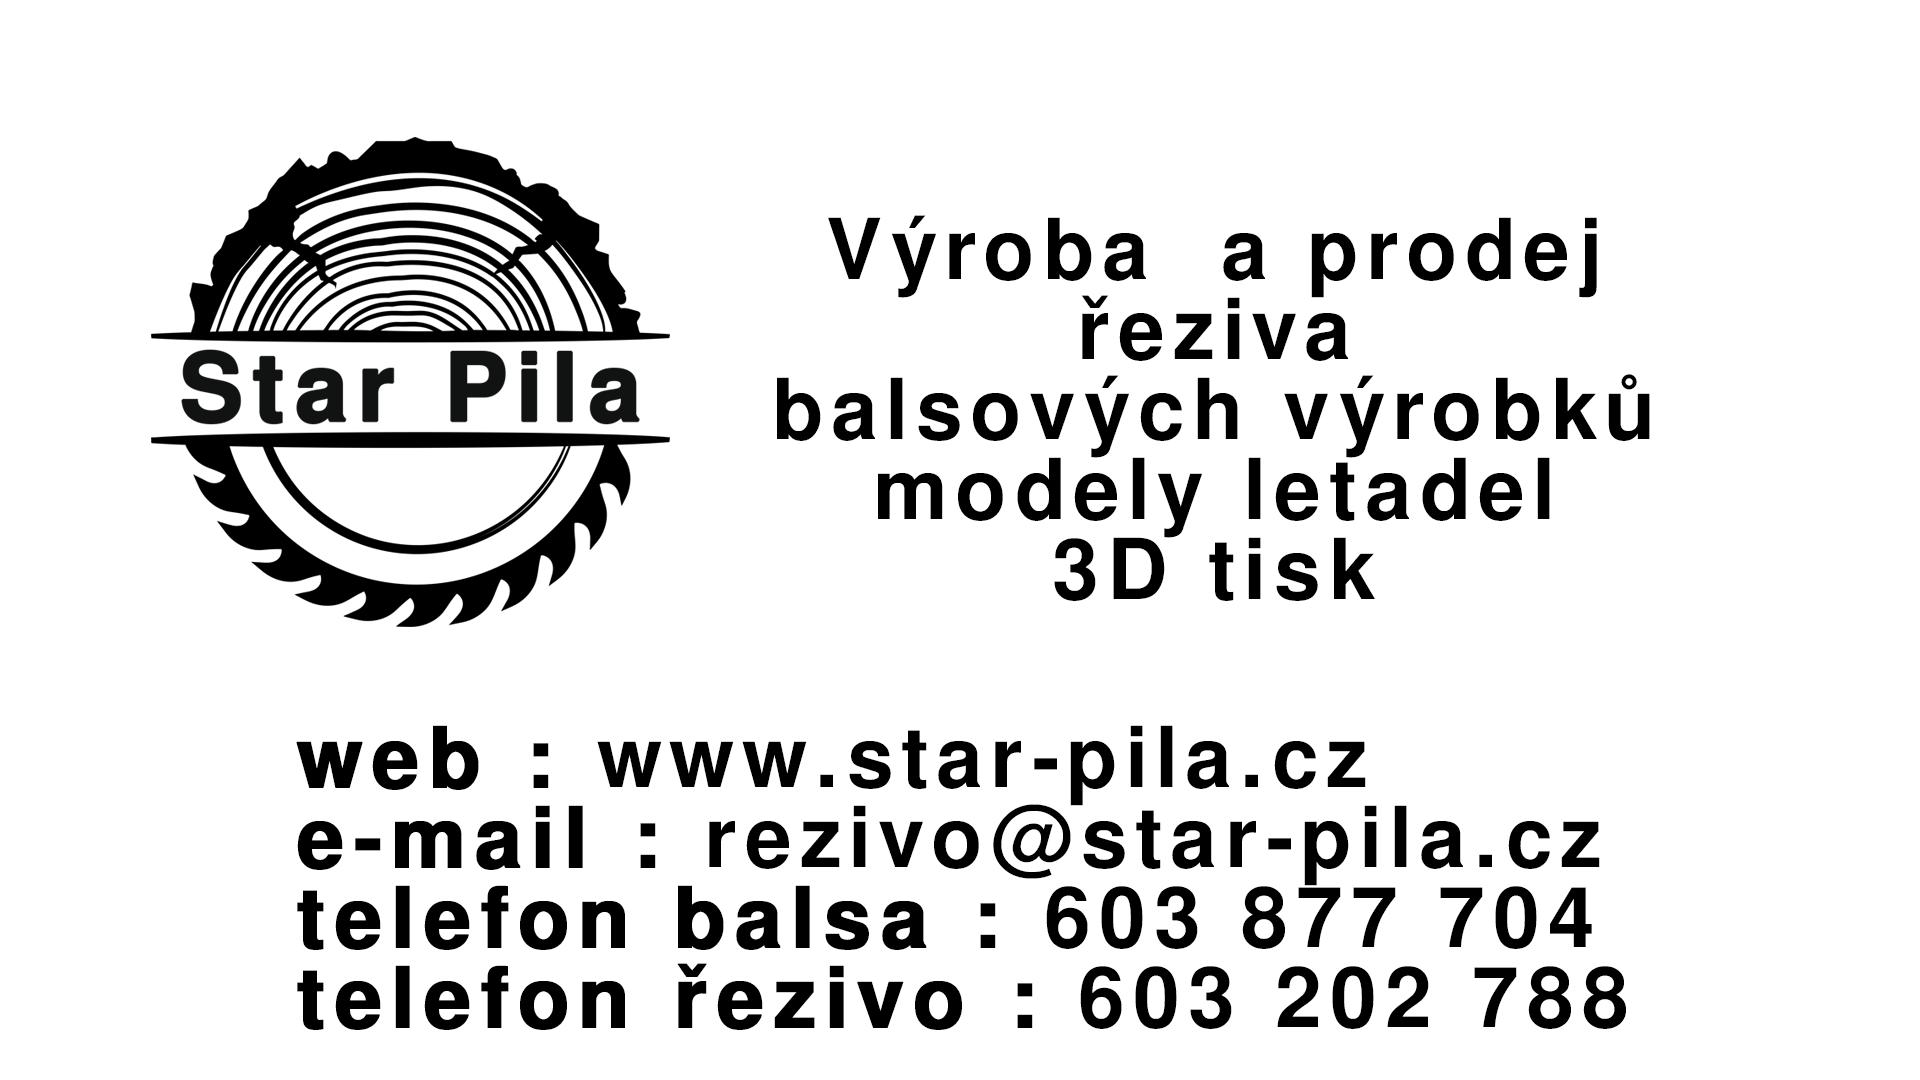 STAR_PILA